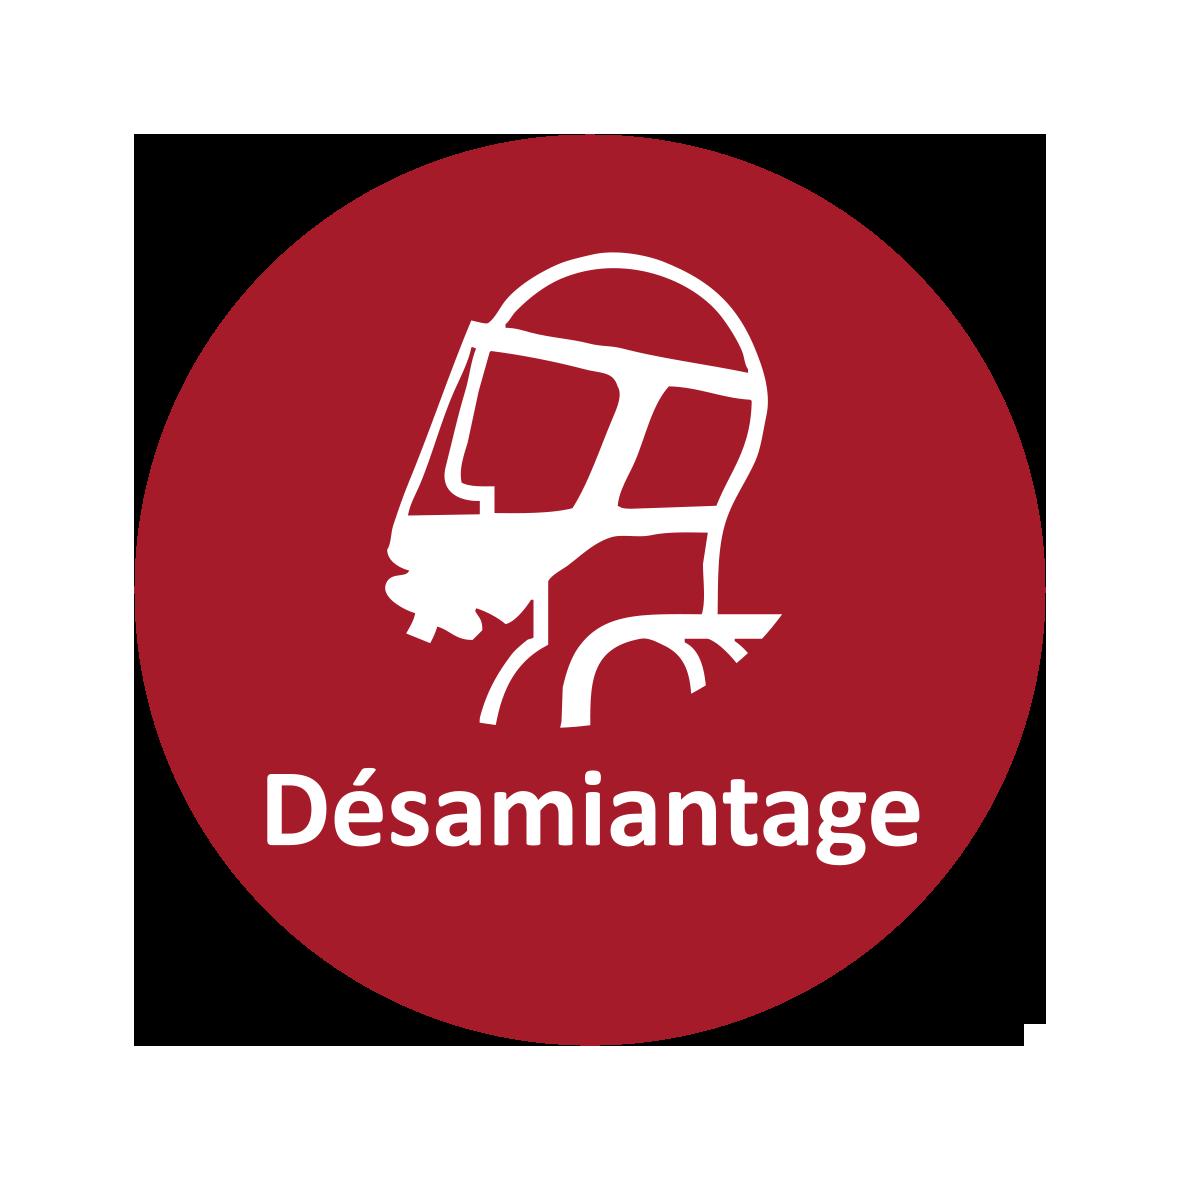 BELAIR_PICTO_DESAMIANTAGE